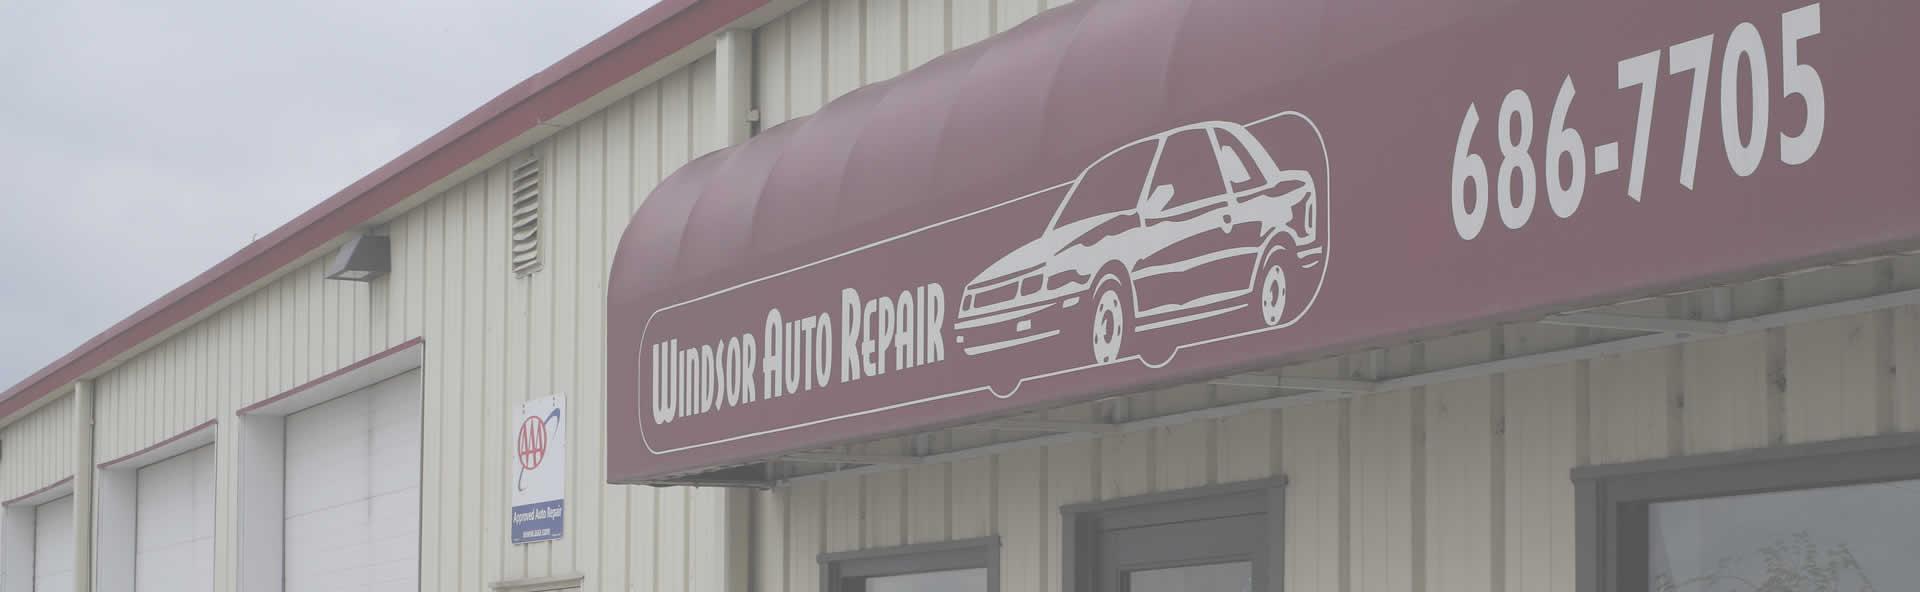 Windsor Auto Repair Store Front